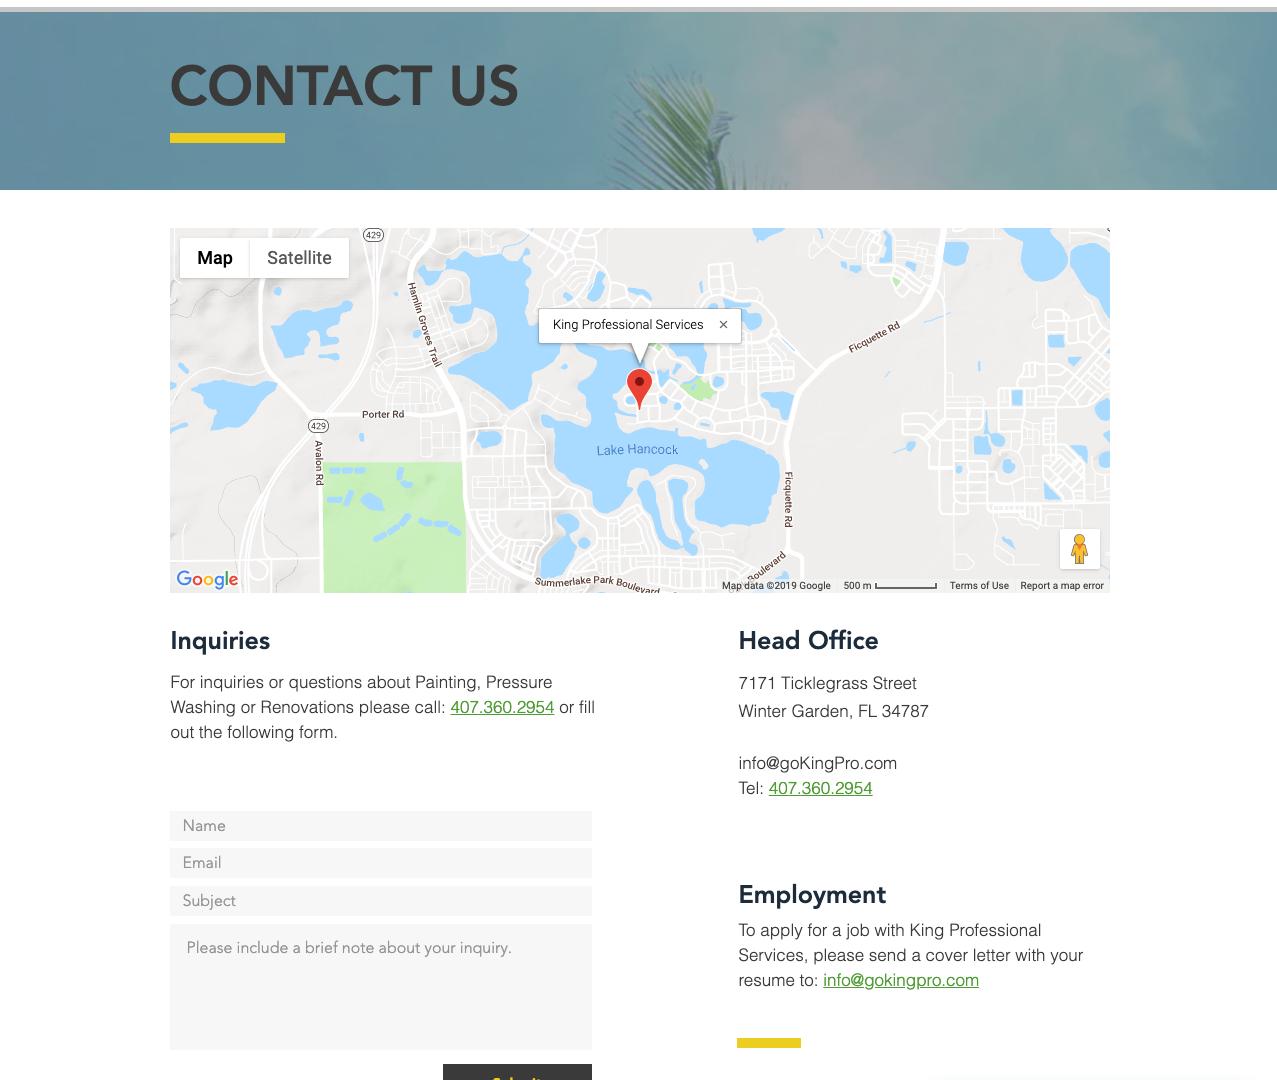 GoKingPro.com Contact Page